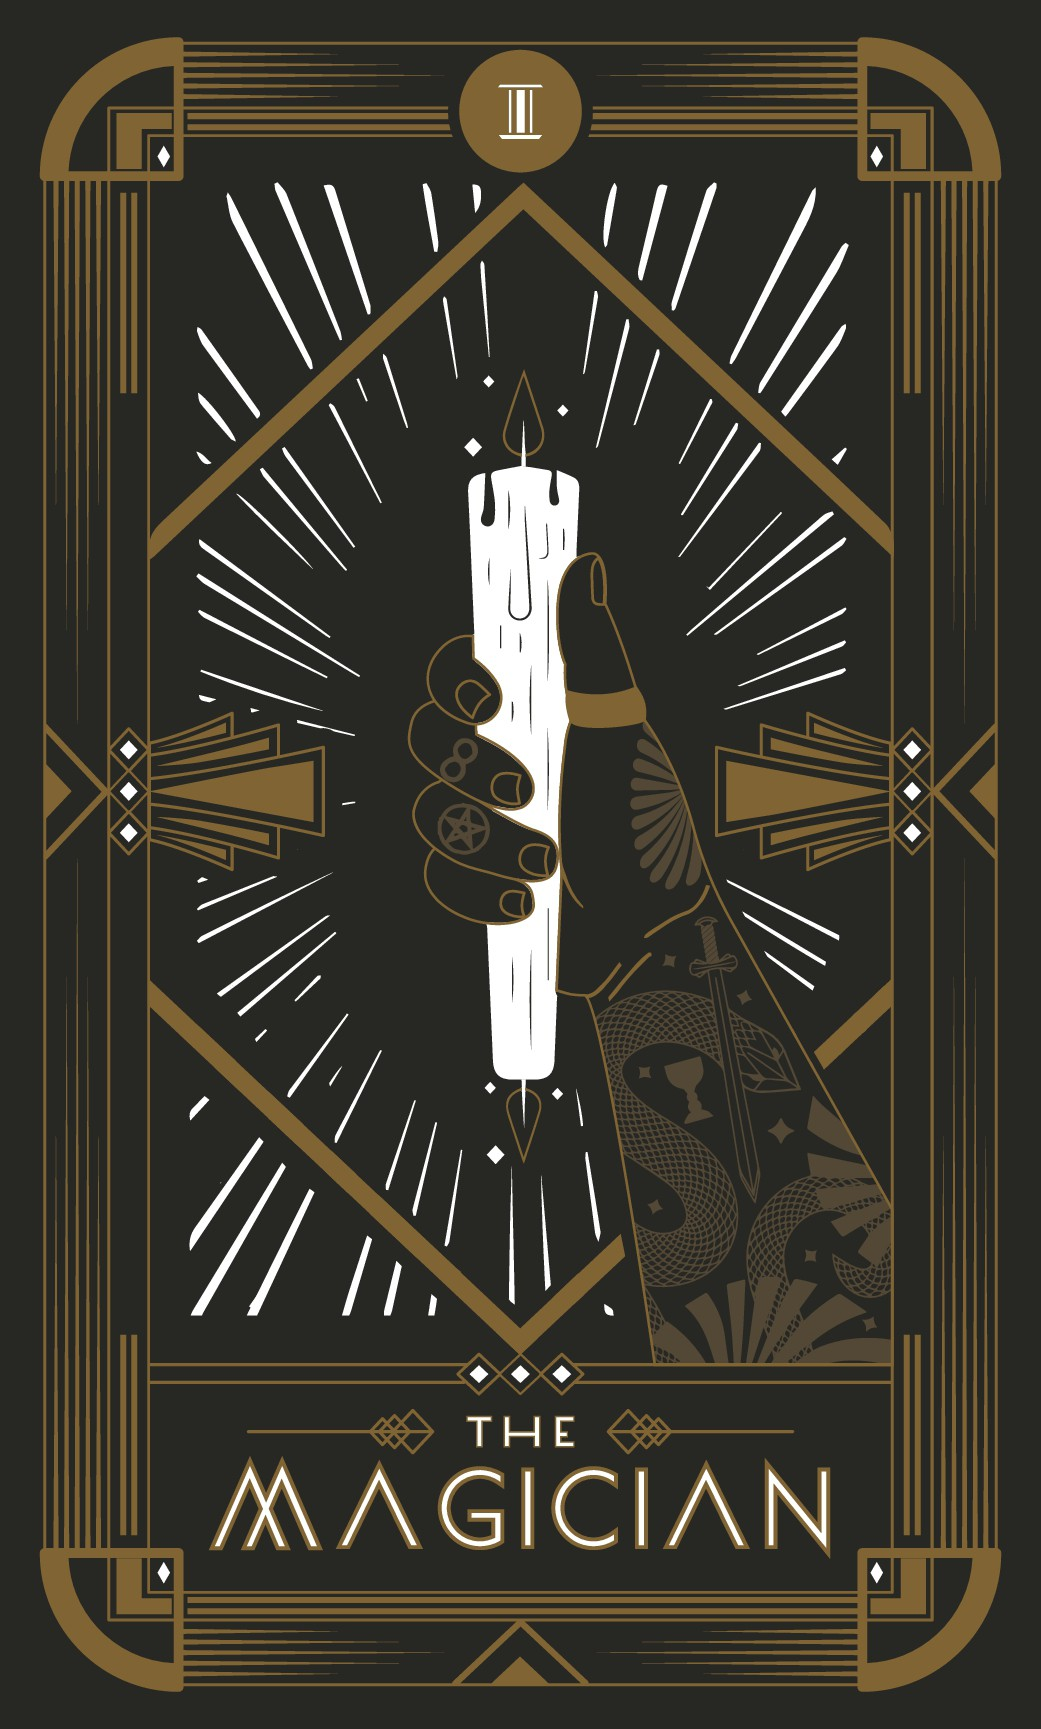 Create a modern, art deco inspired update on The Magician tarot card